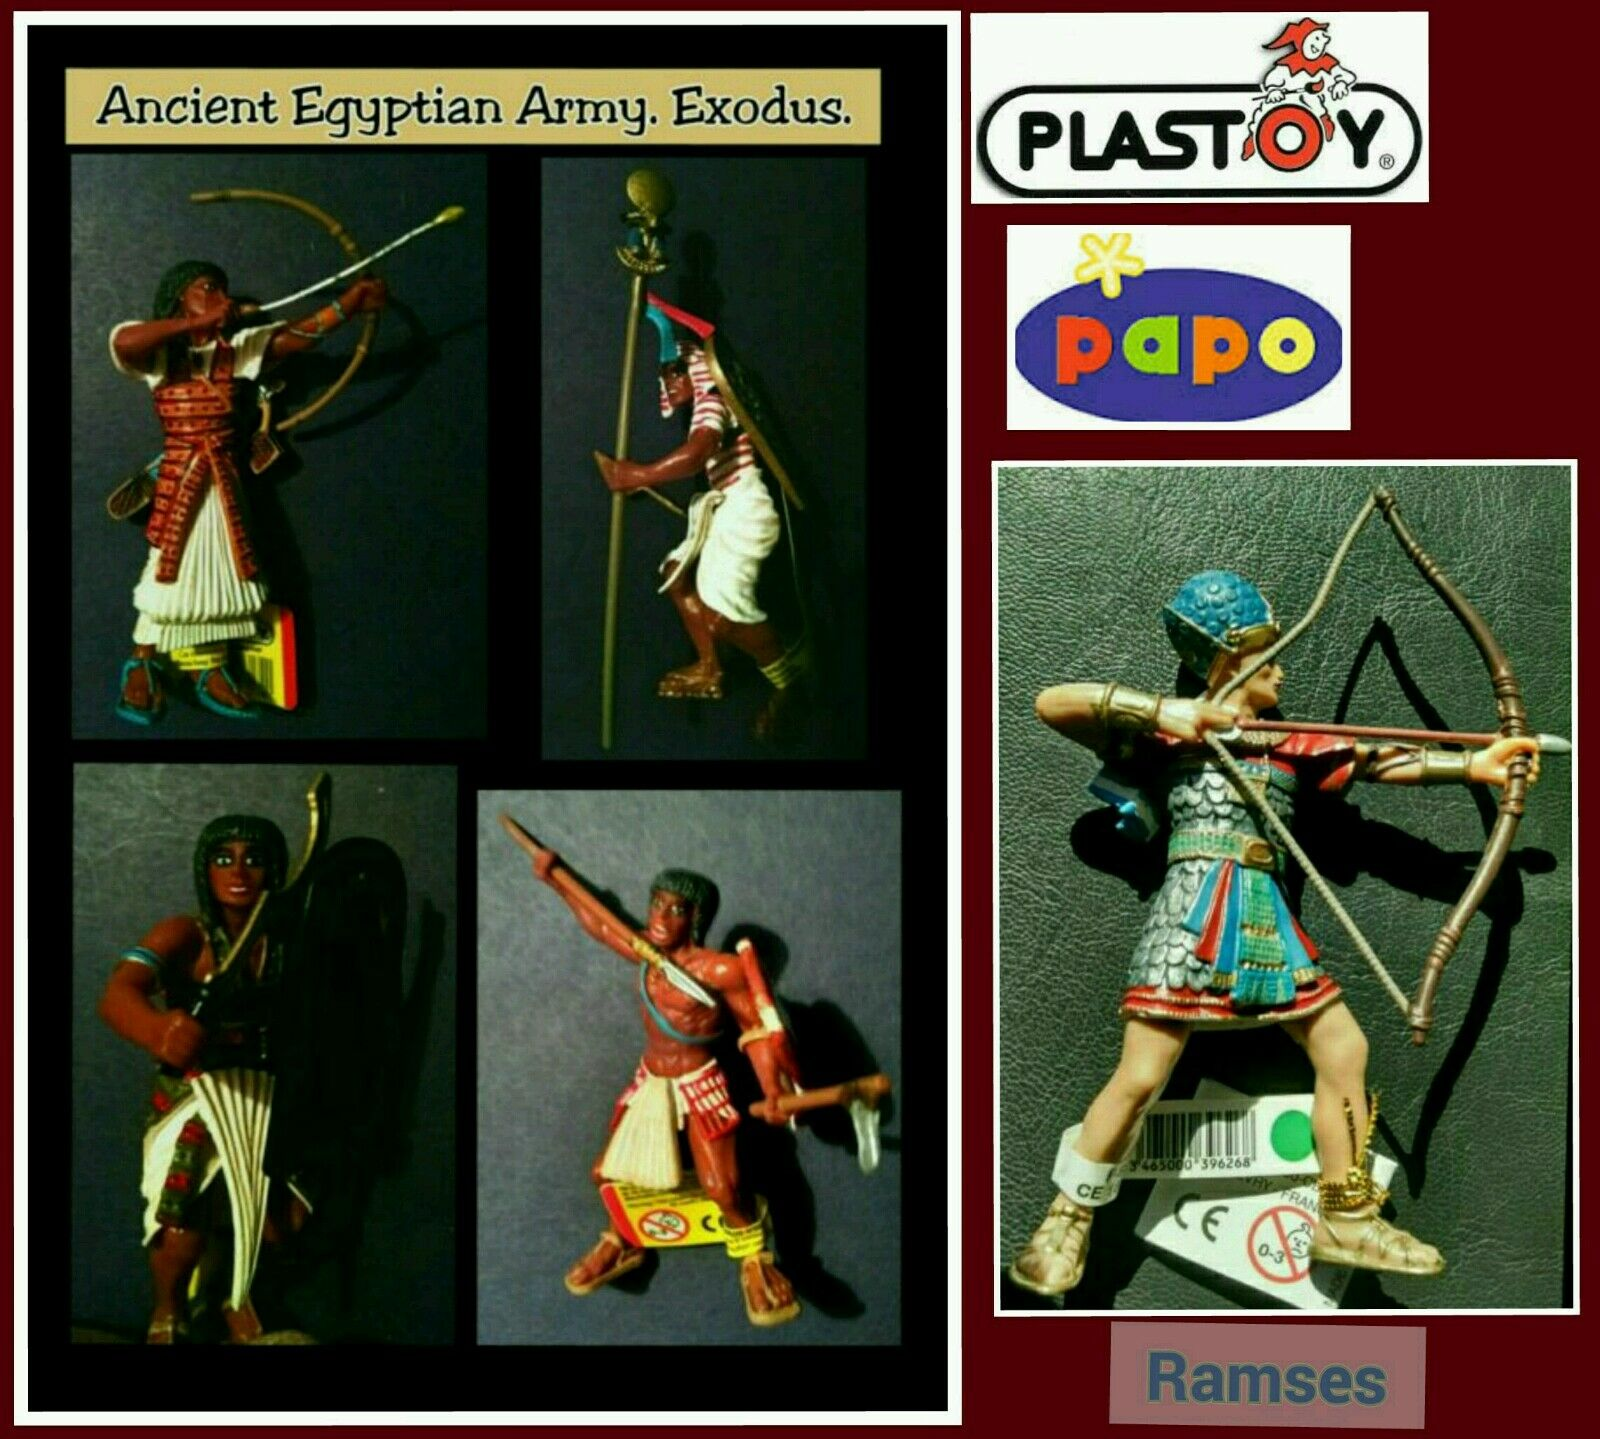 Plastoy Ancient Egypt Action Figures 5pc lot Ramses II Egyptian Pharaoh's Army